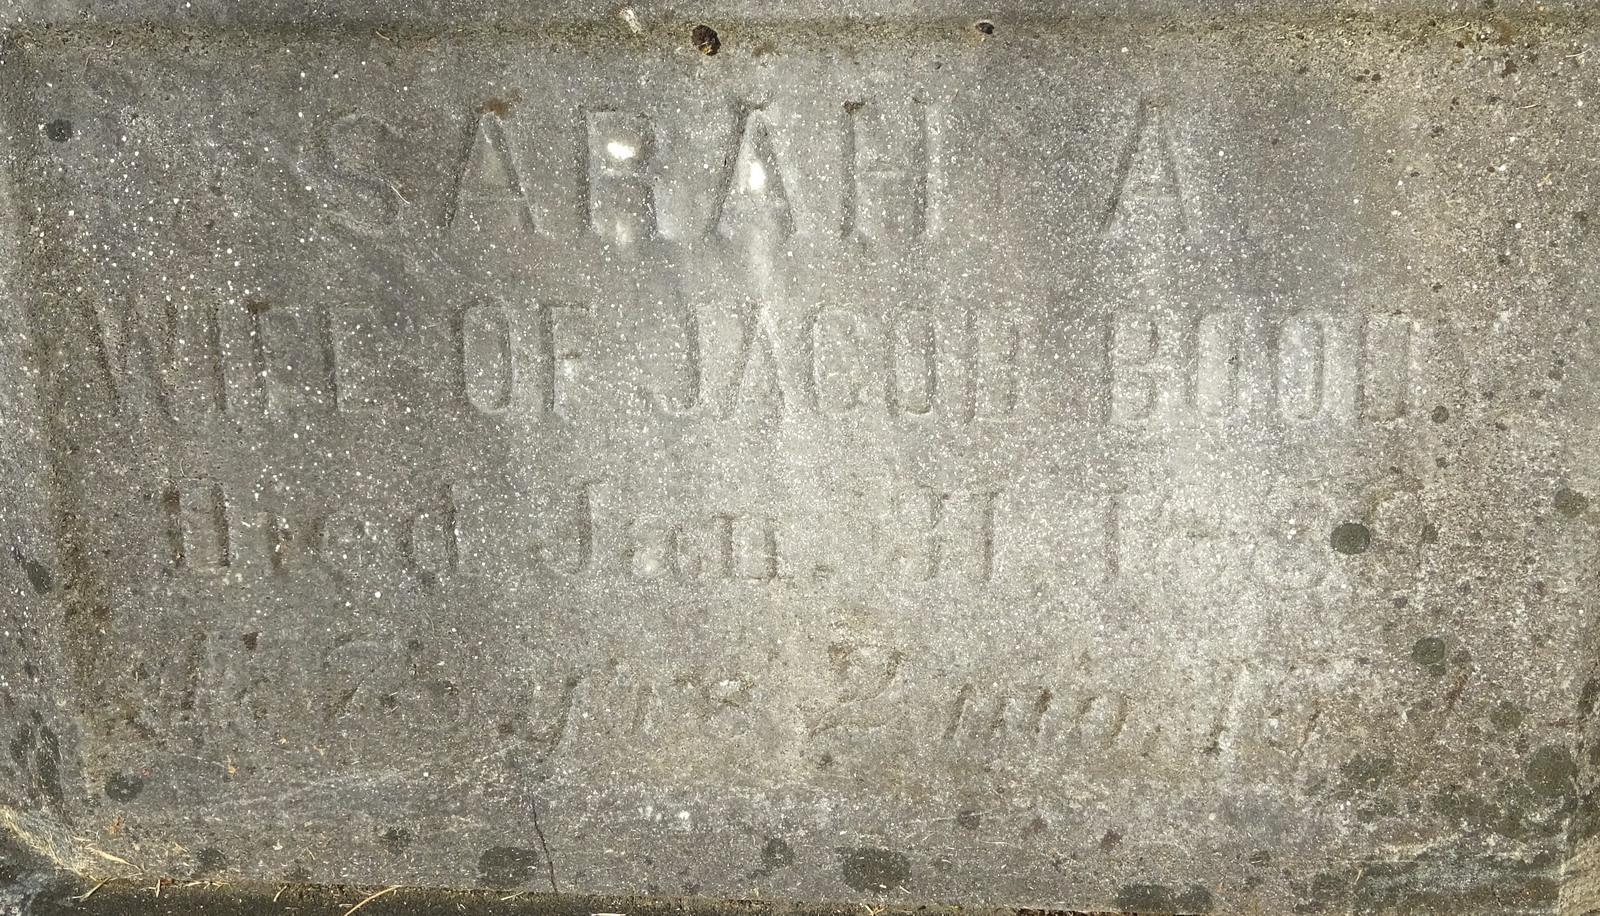 Sarah Ann <i>Lawrence</i> Boody